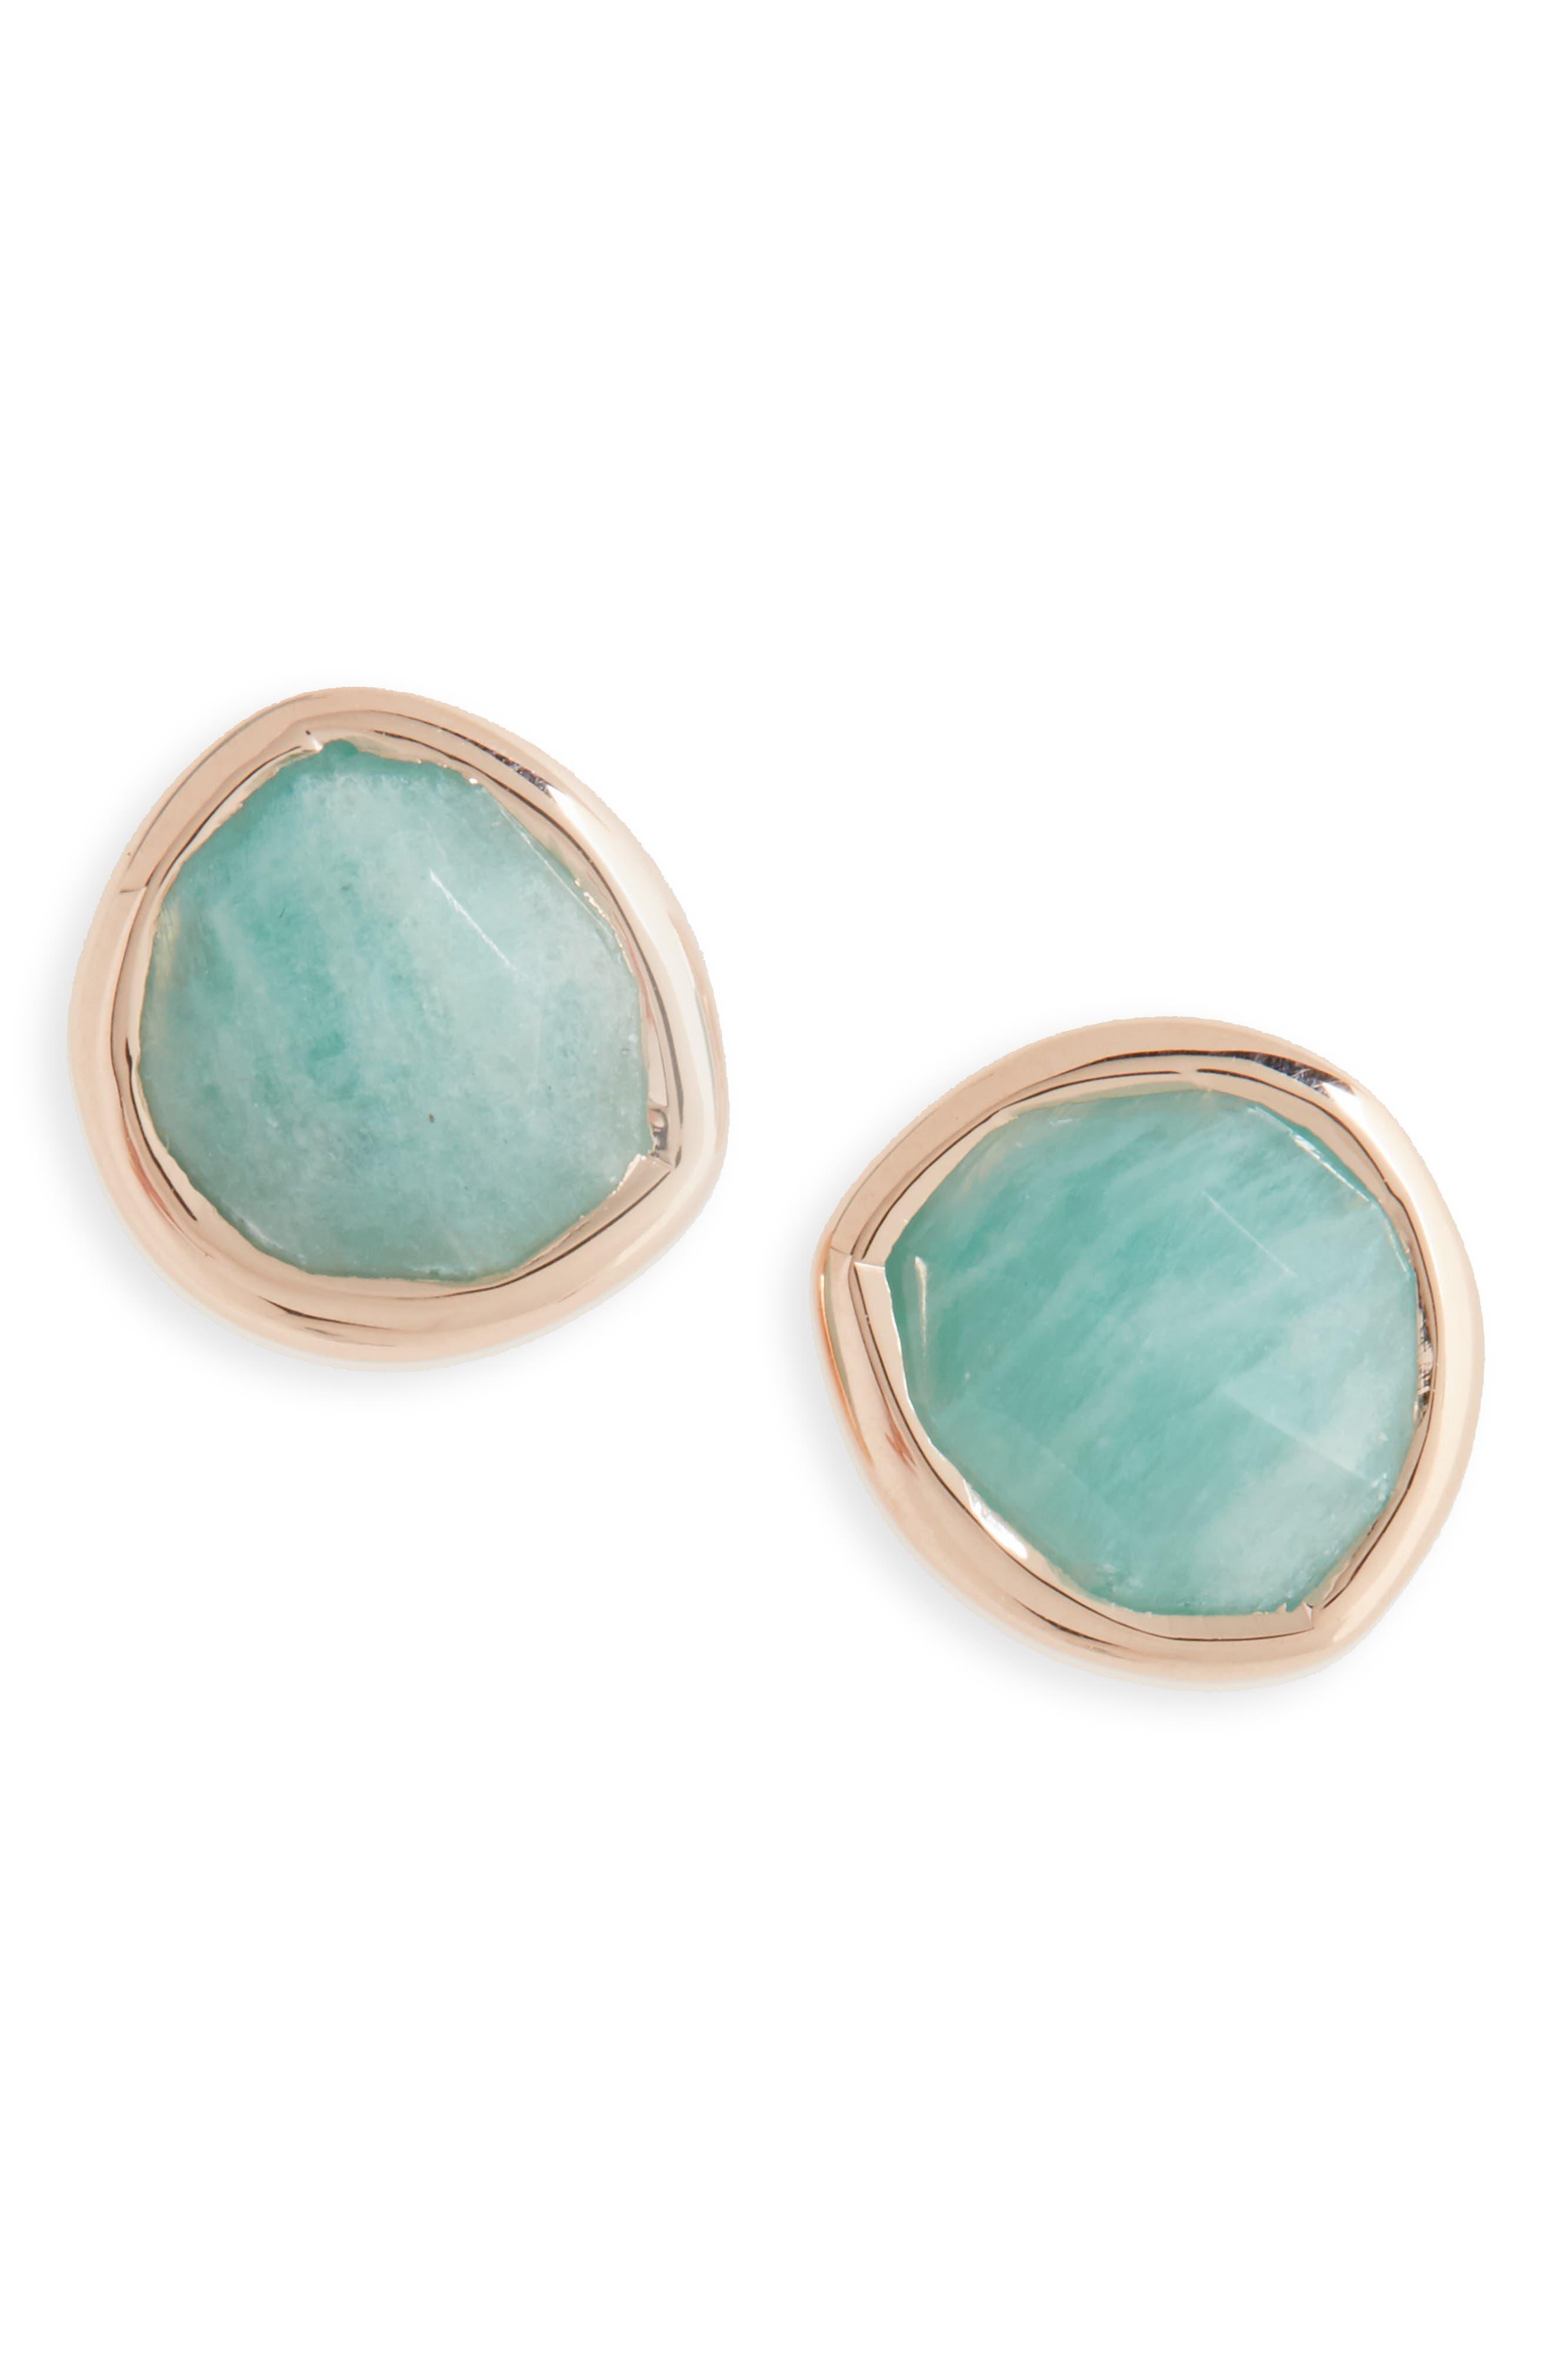 'Siren' Semiprecious Stone Stud Earrings,                             Main thumbnail 1, color,                             AMAZONITE/ ROSE GOLD